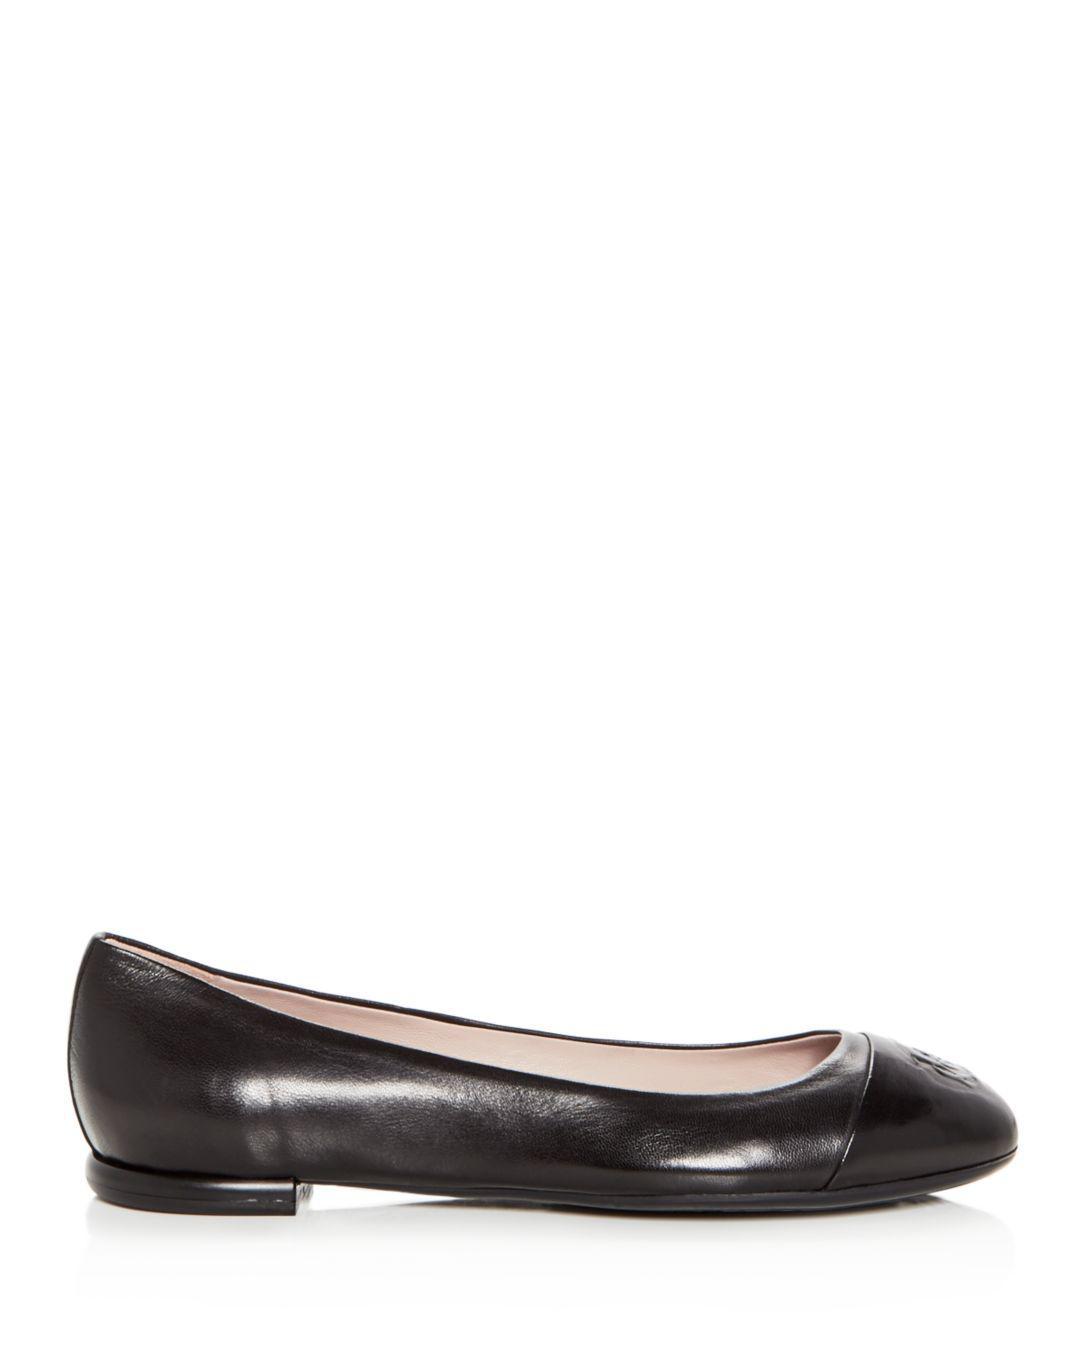 d16ed6eae68 Lyst - Taryn Rose Rosa Ballet Flat in Black - Save 58%